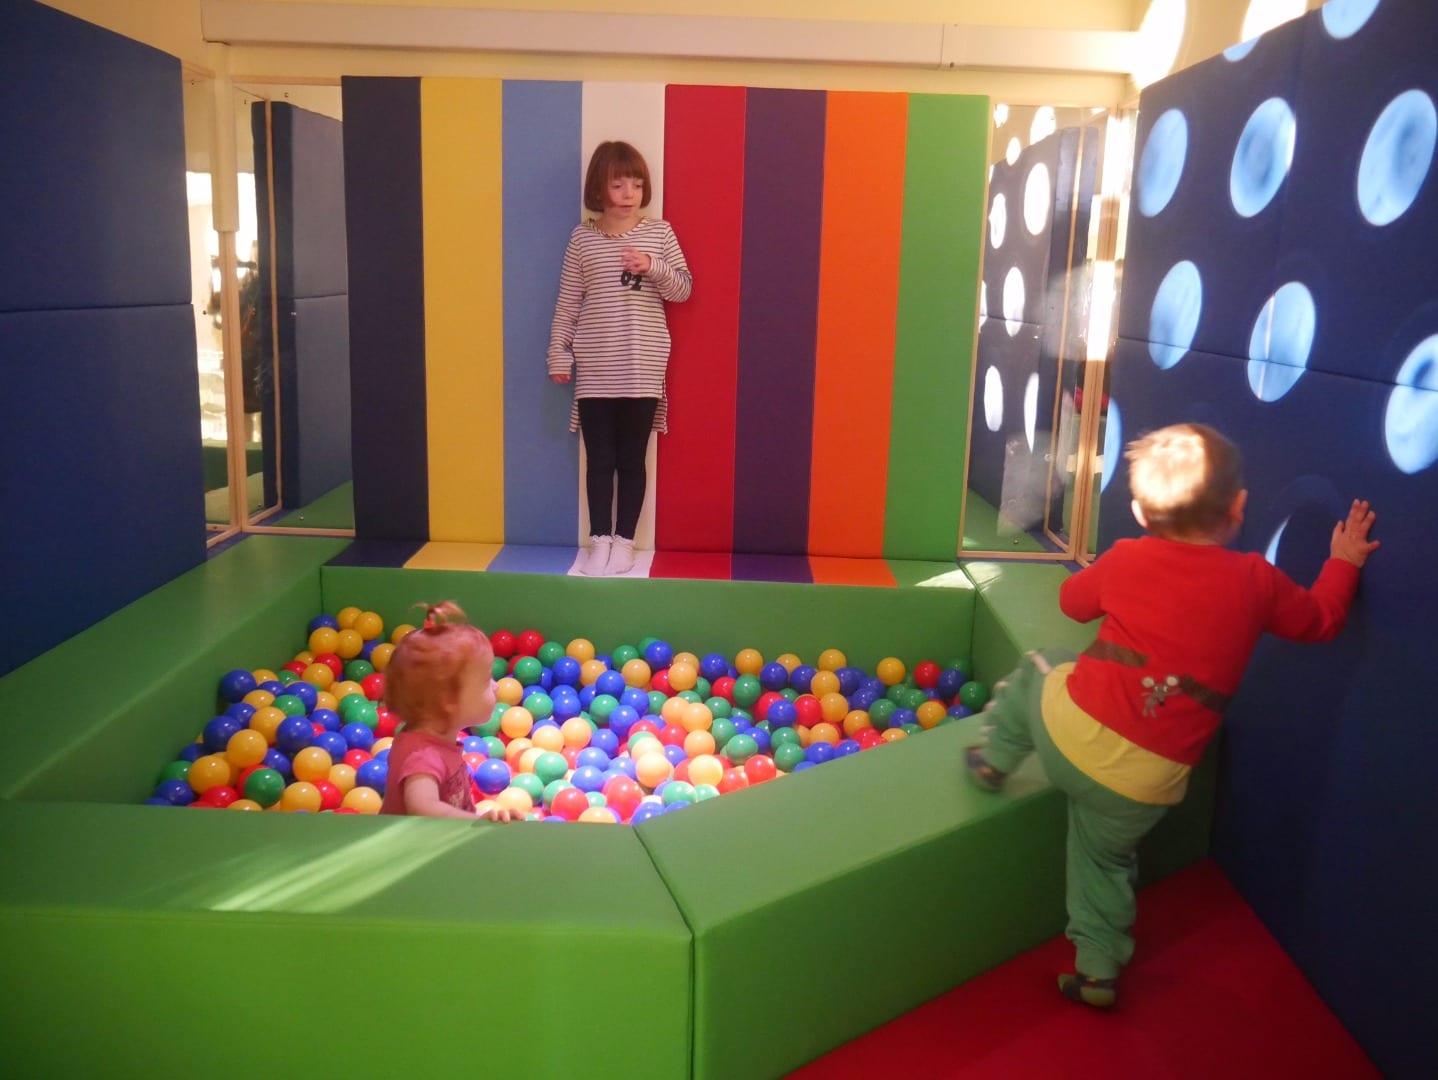 Aiming Higher Ball Pool and Sensory Room